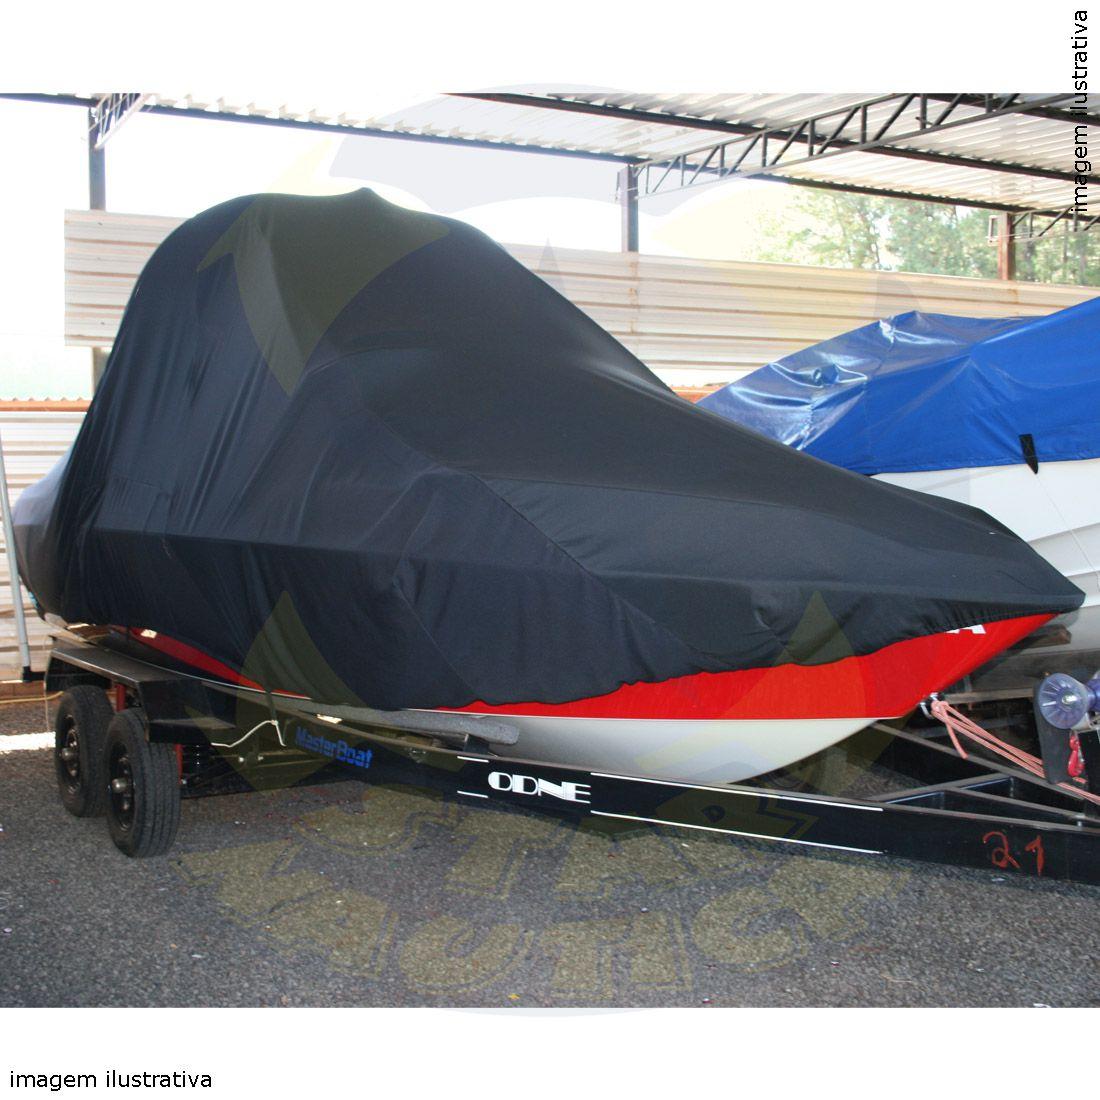 Capa Lona de Cobertura Lancha Focker 230 Black Edition com Targa Lona Guarda Chuva